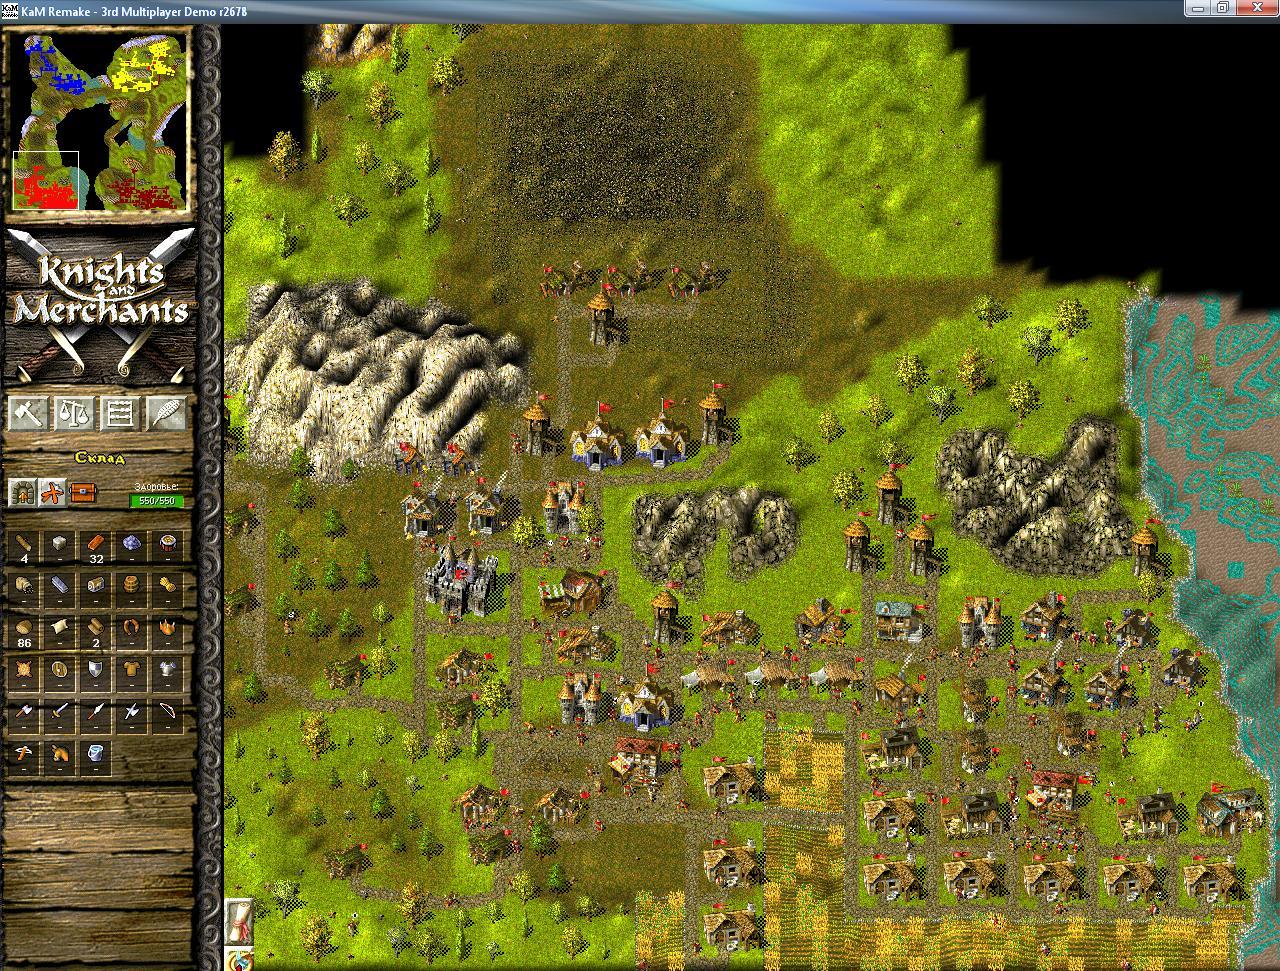 9.JPG - Knights & Merchants: The Peasants Rebellion